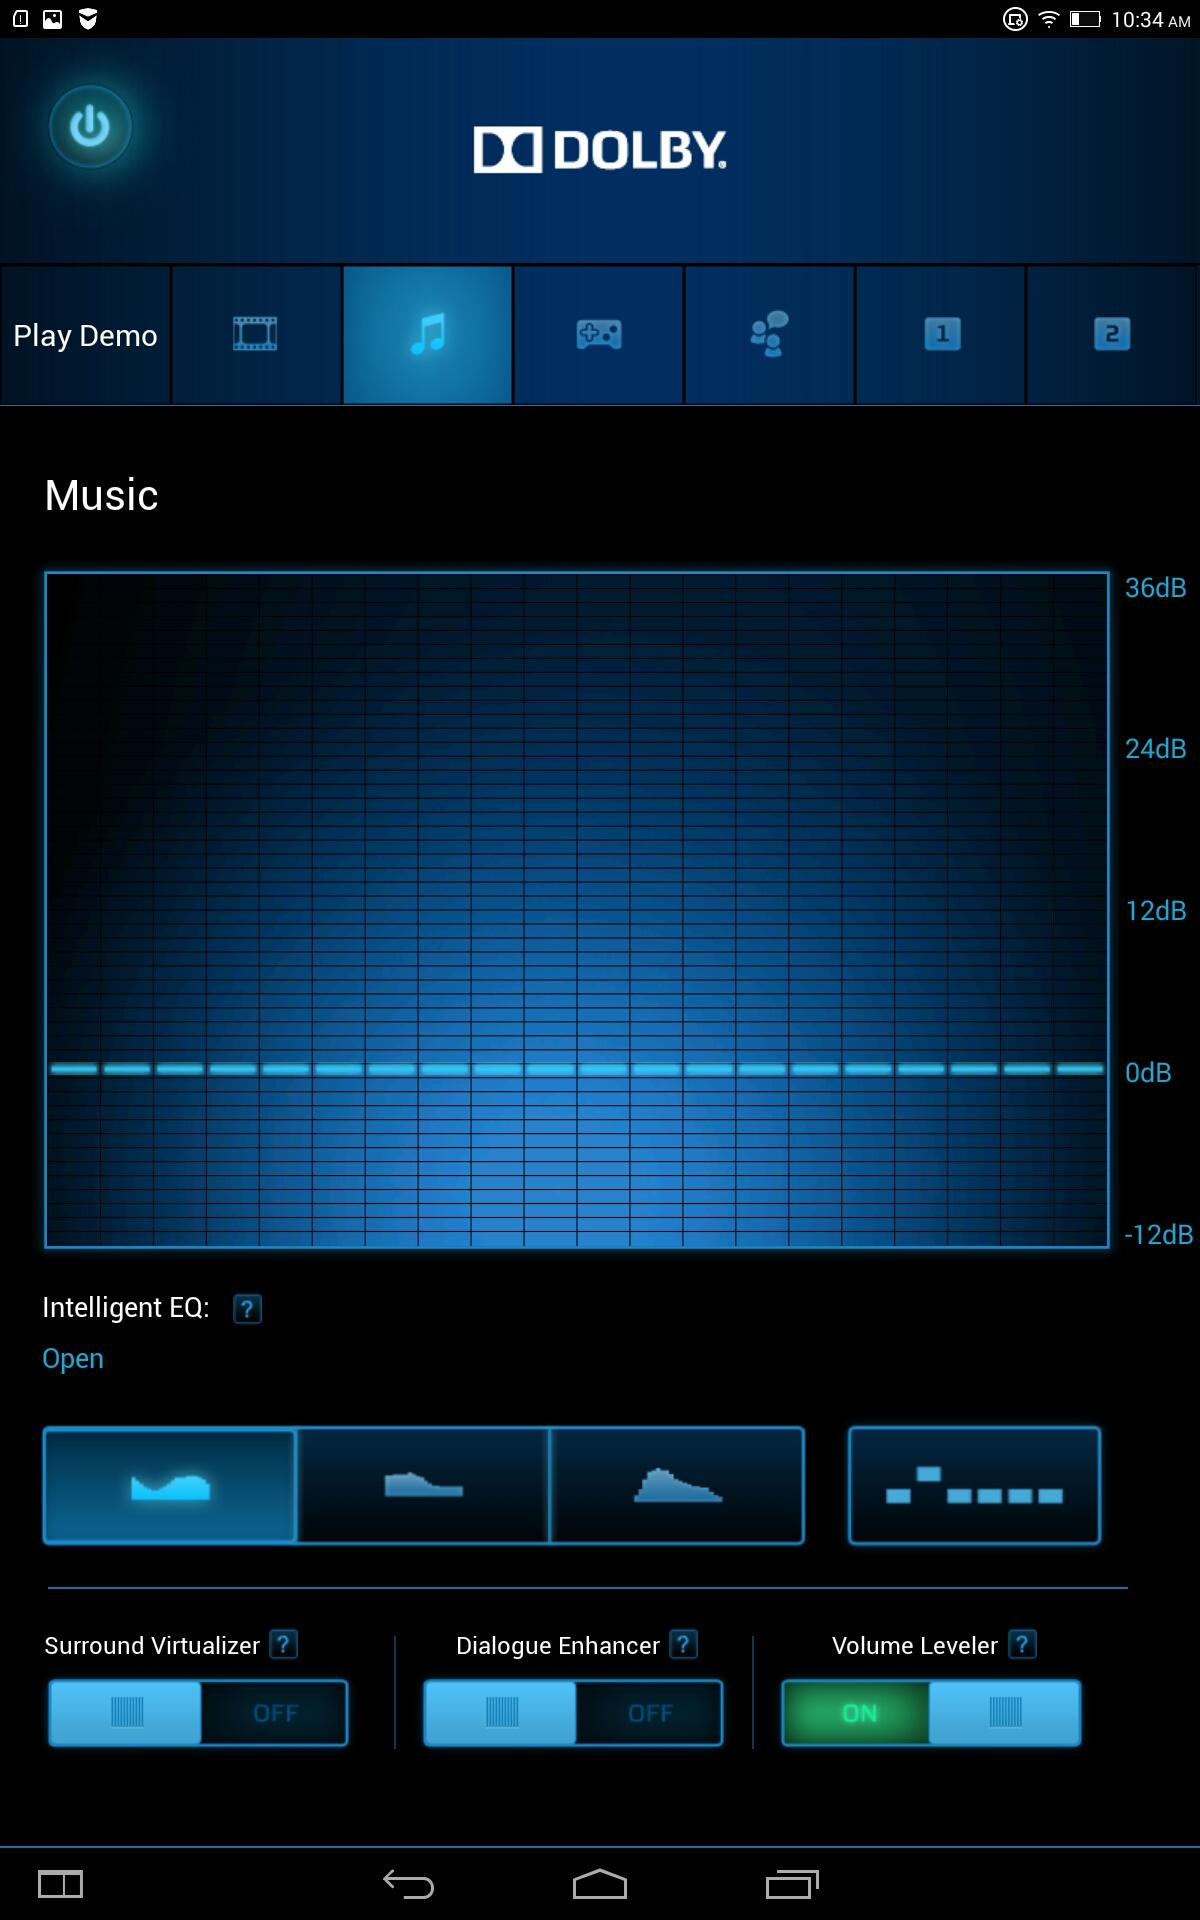 Screenshot_2015-02-06-10-35-00-806